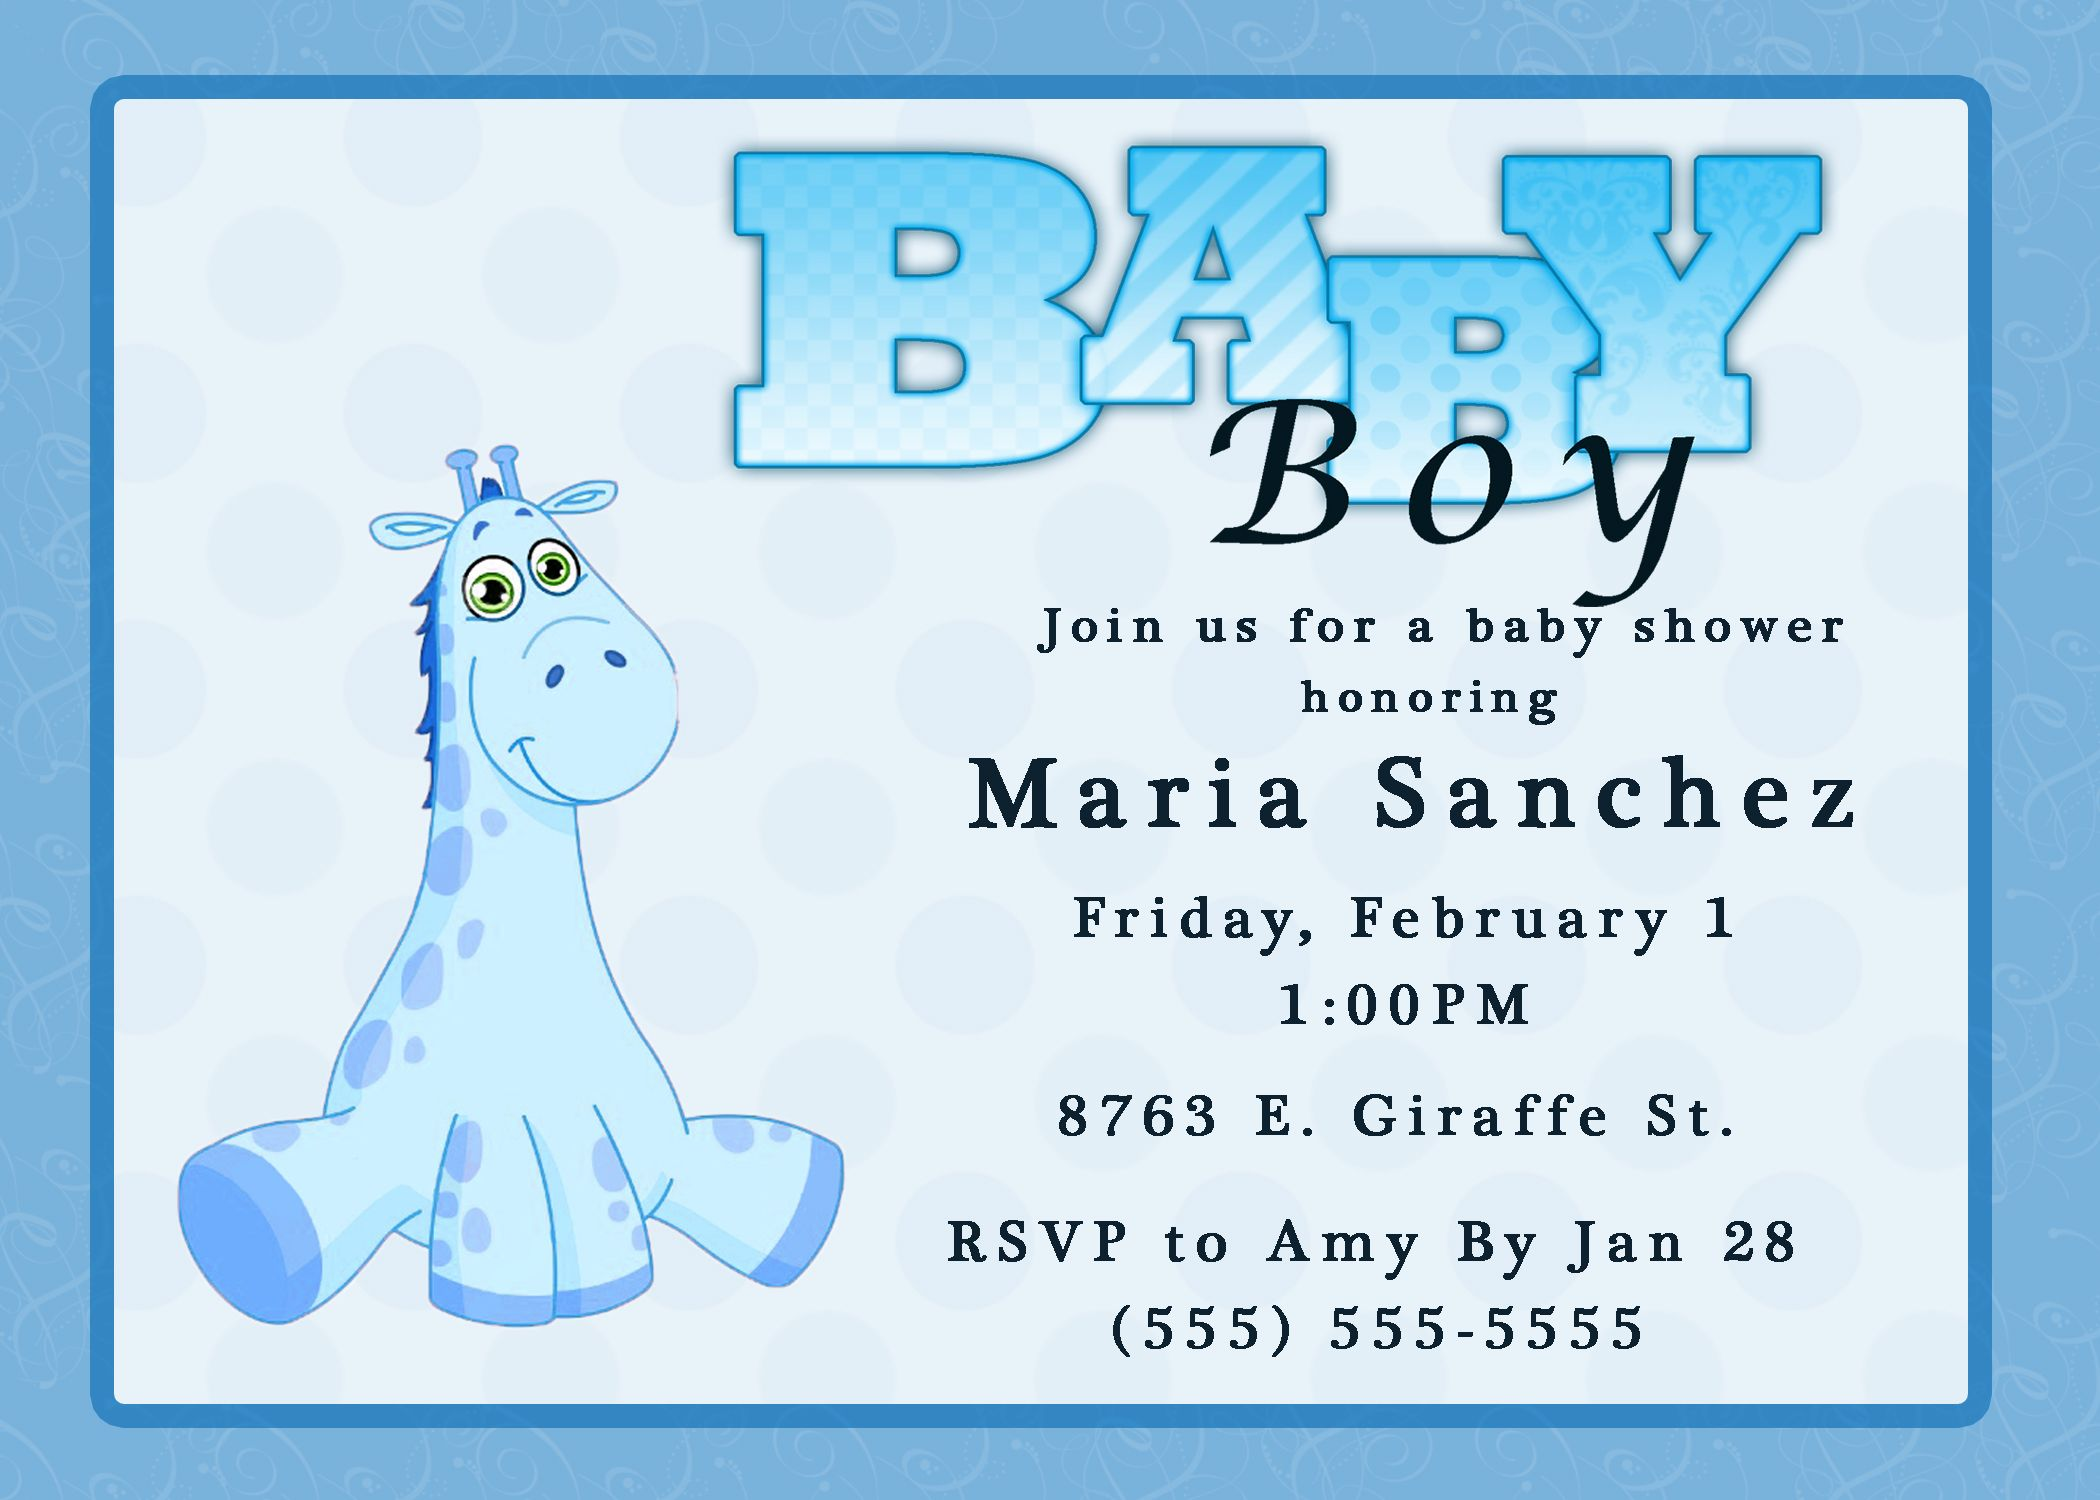 Giraffe Boy Baby Shower Invitation Kustom Kreations | CourtneyHouse ...